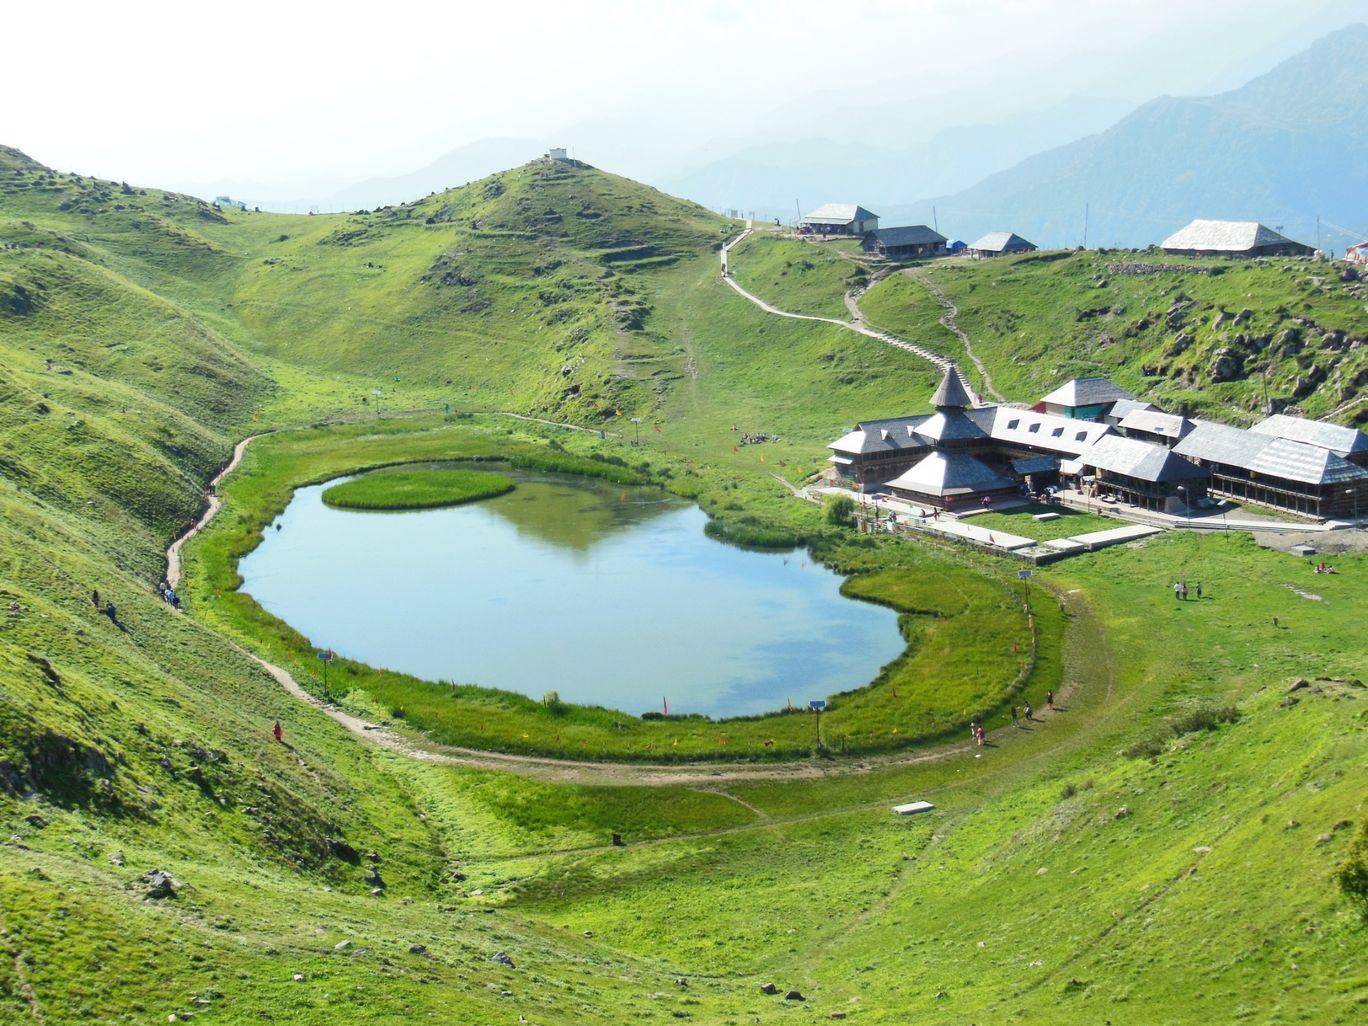 Photo of Prashar Lake - Sunshine Himalayan Camp By NirvanaSeeker (ऋषि)